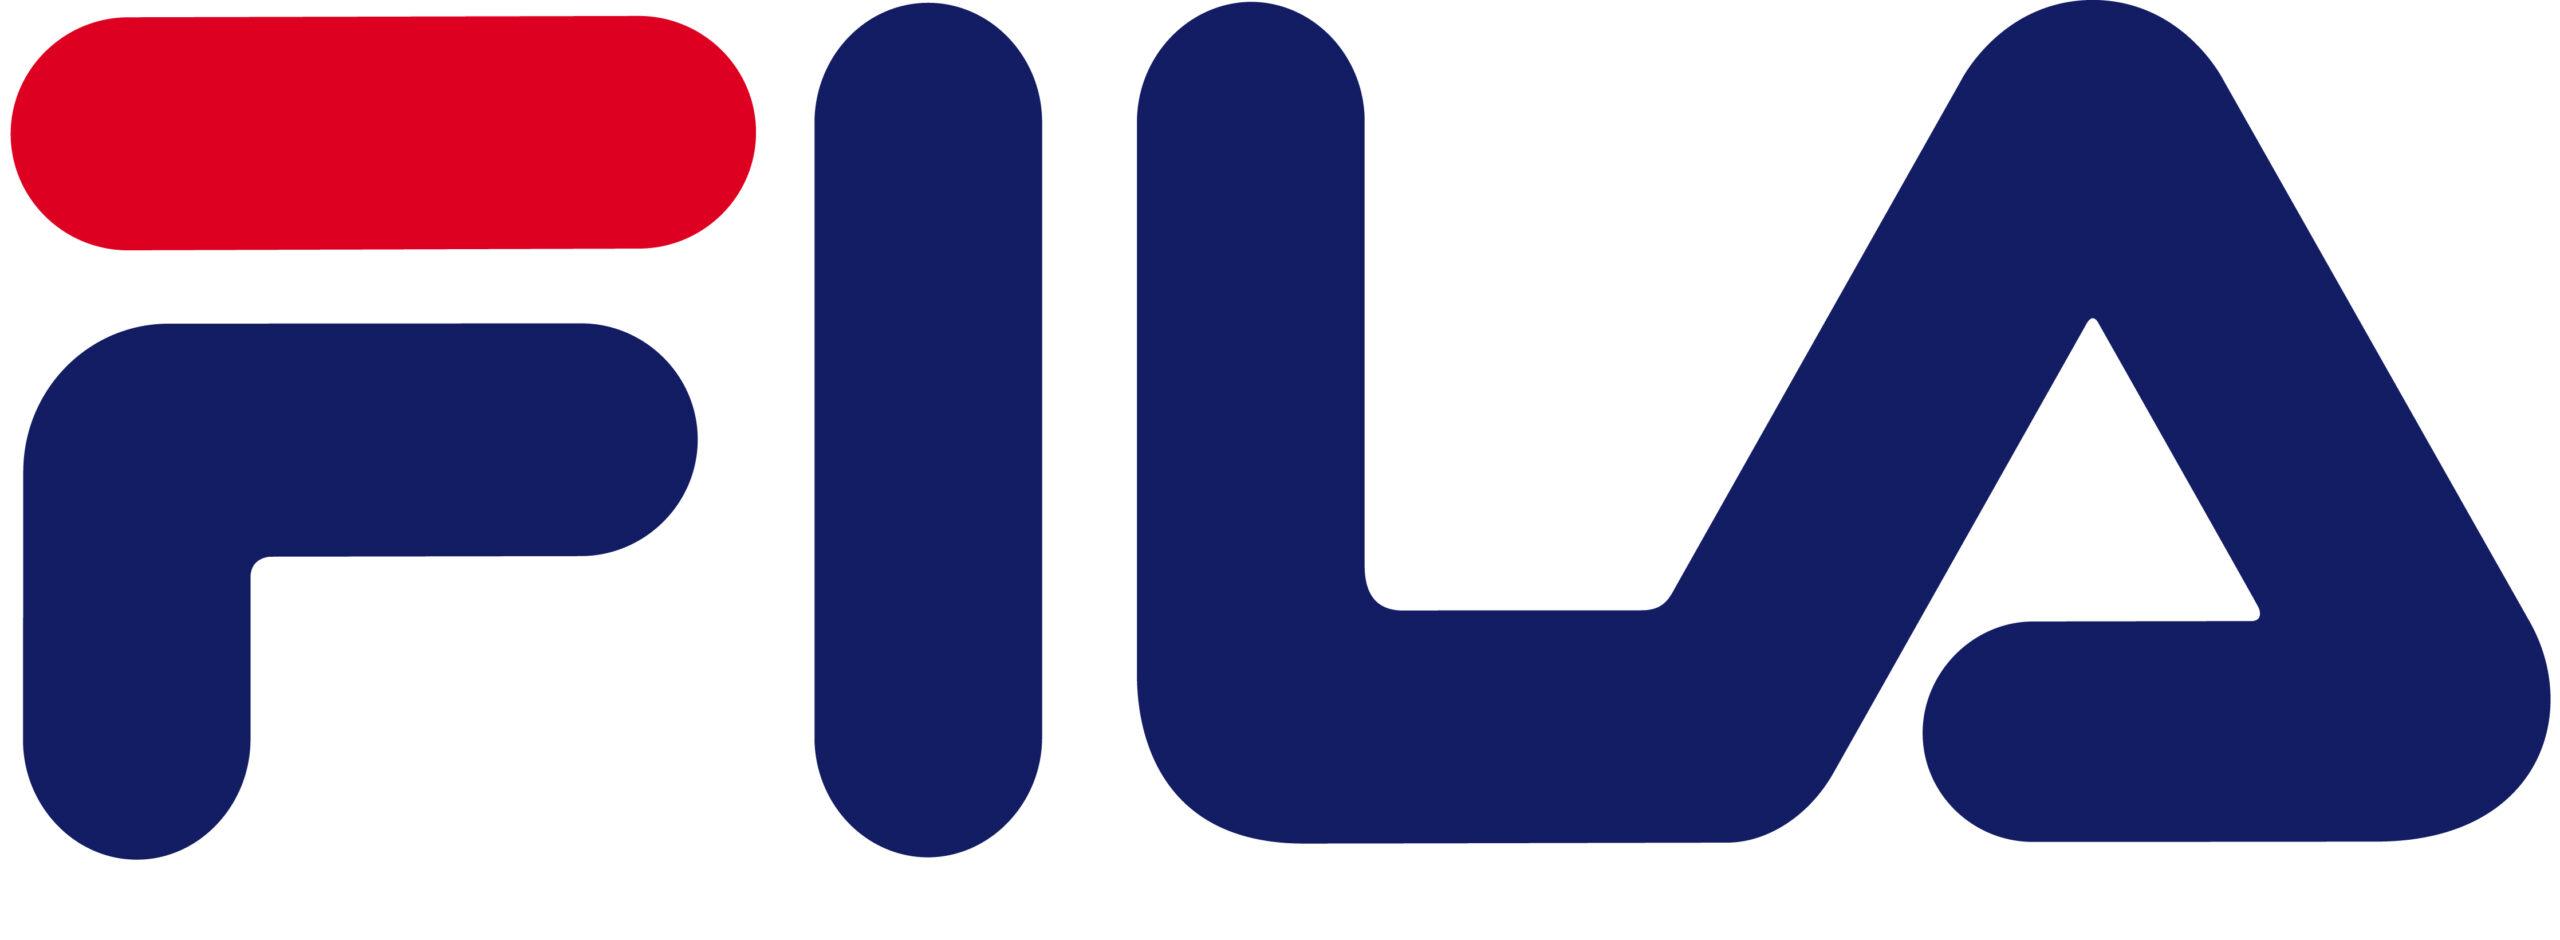 Is Fila a cool brand?